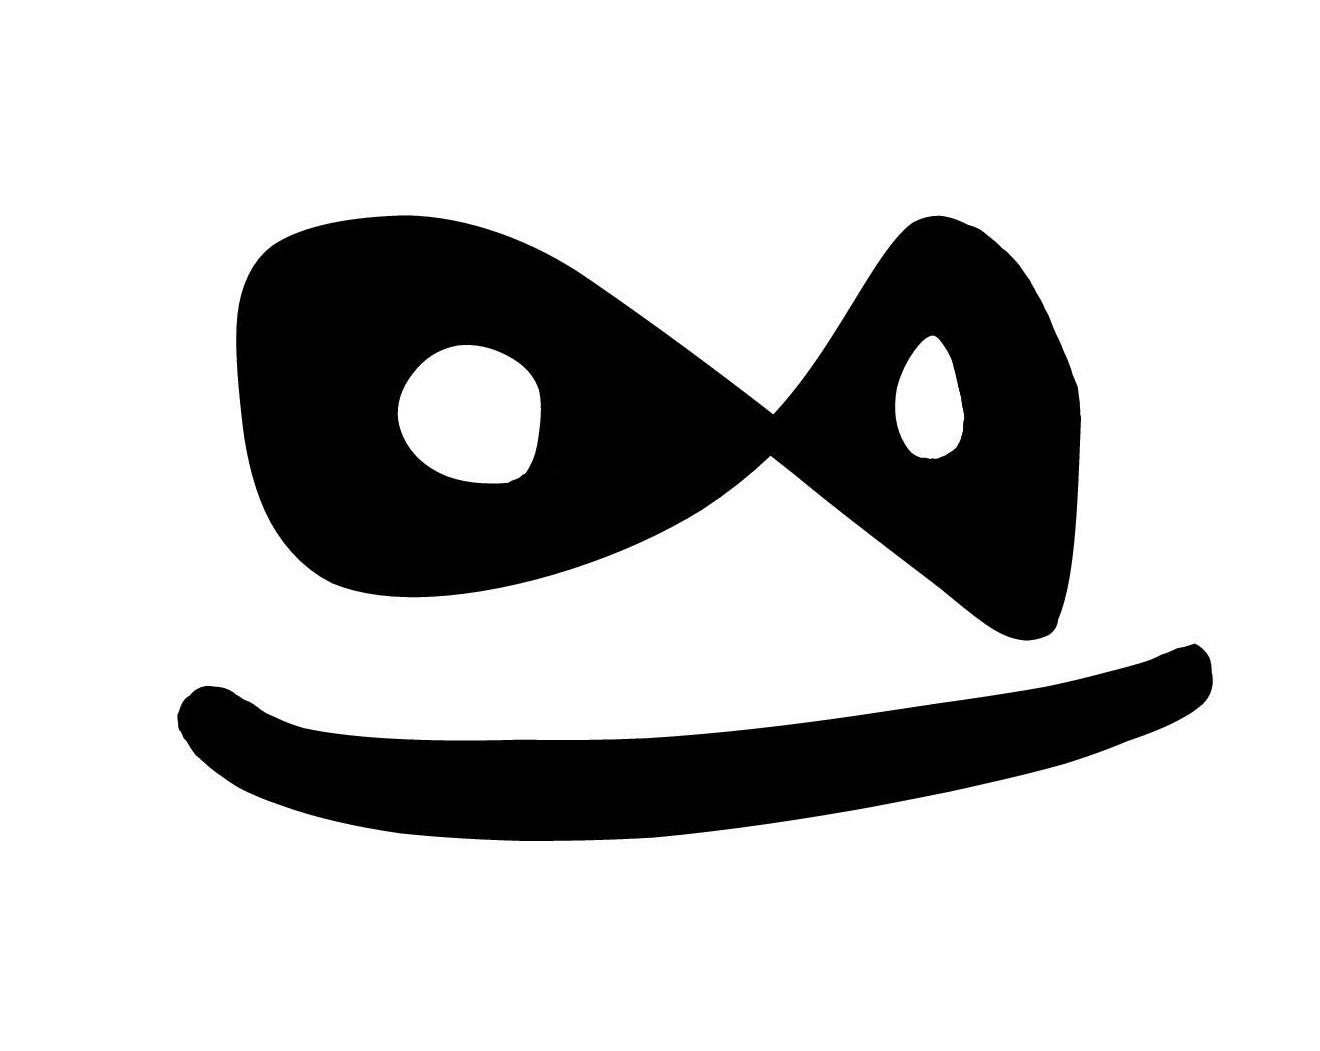 g18 logo